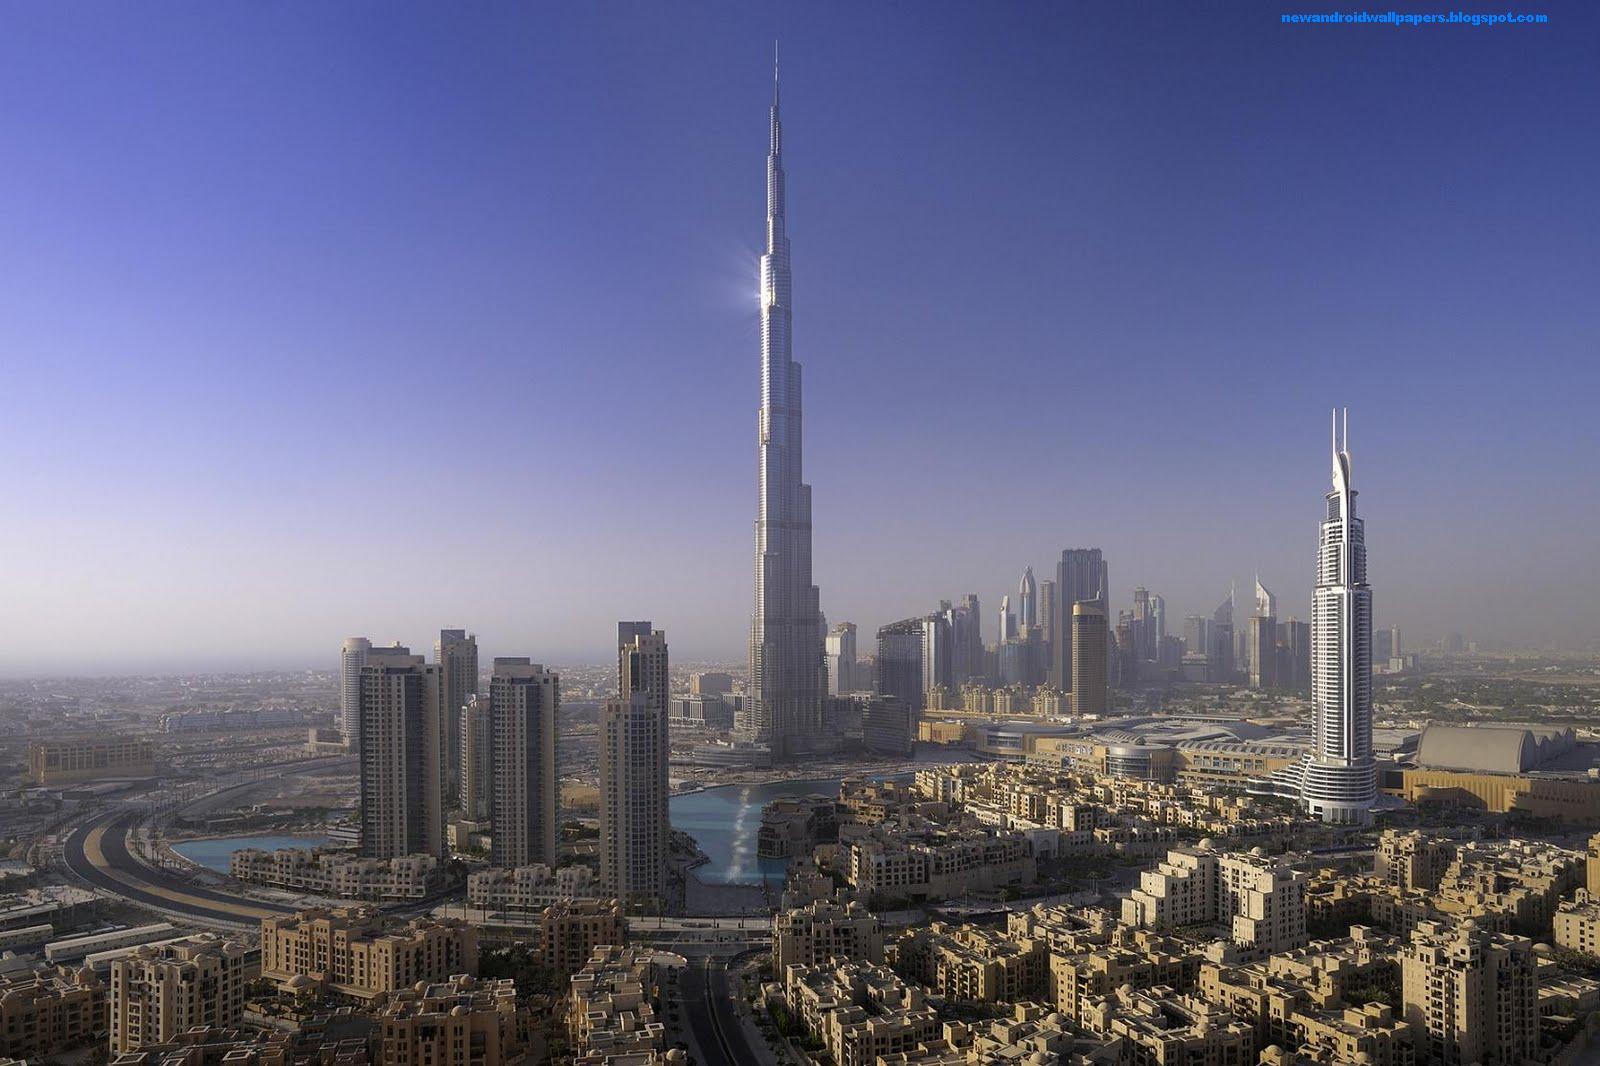 Burj Khalifa Hd Photos: Burj Al Khalifa Wallpapers Hd Free Download For Android